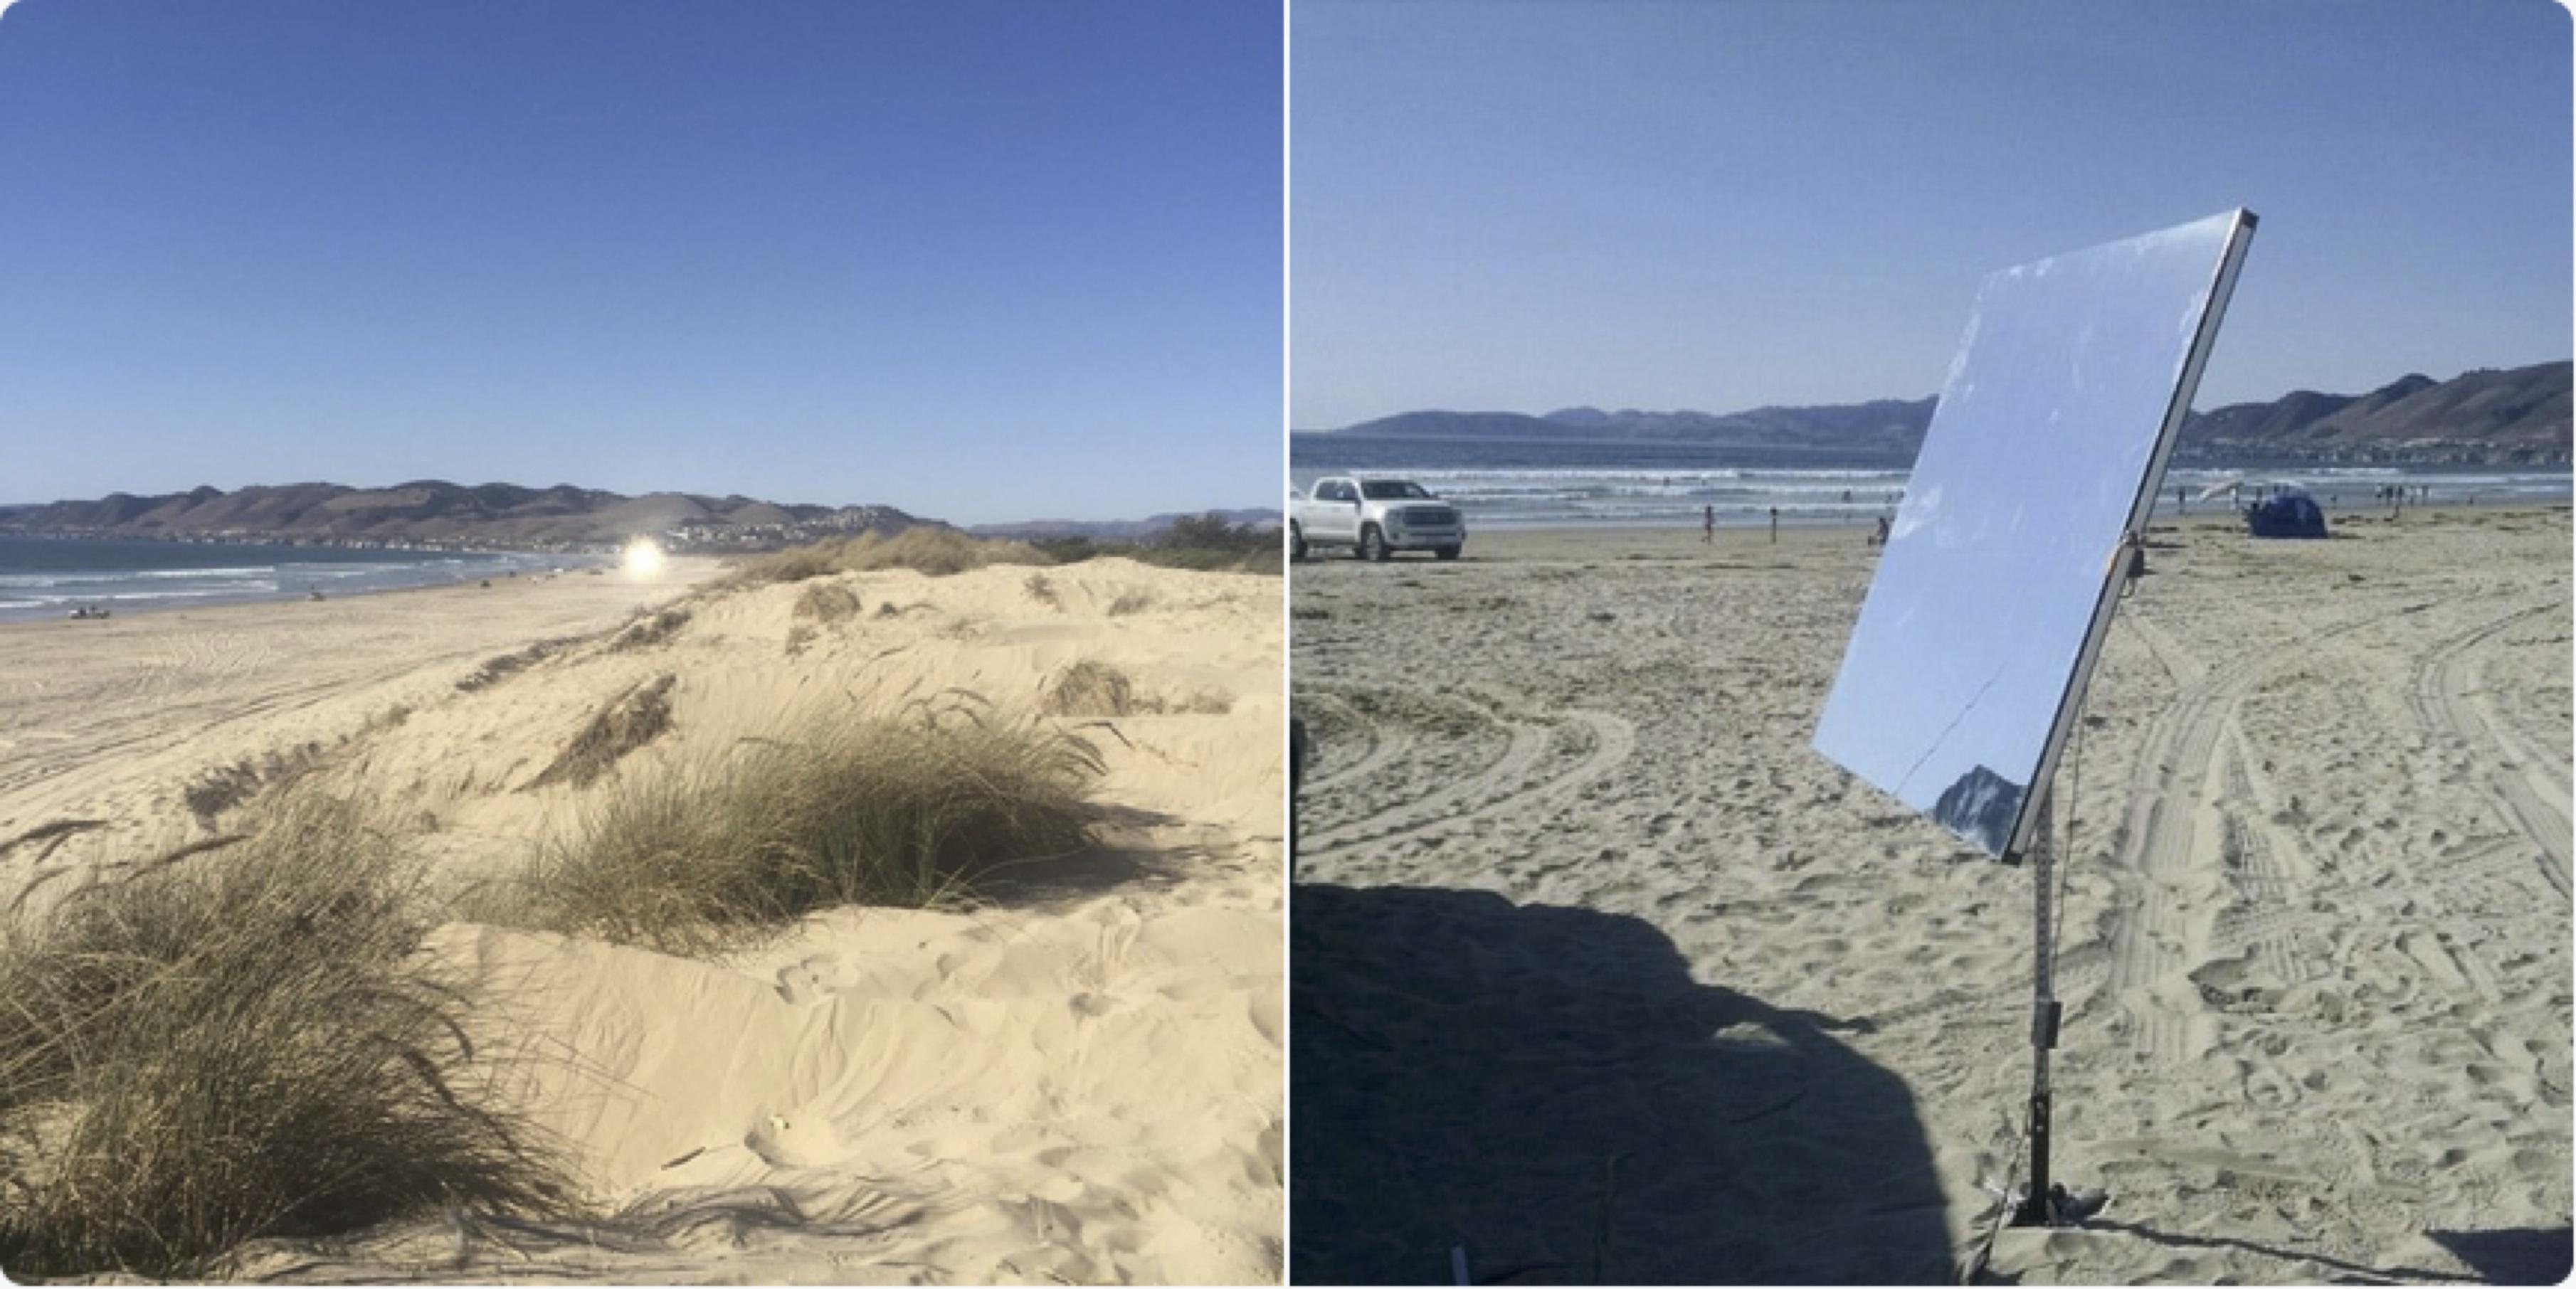 heliostat_beach_testing